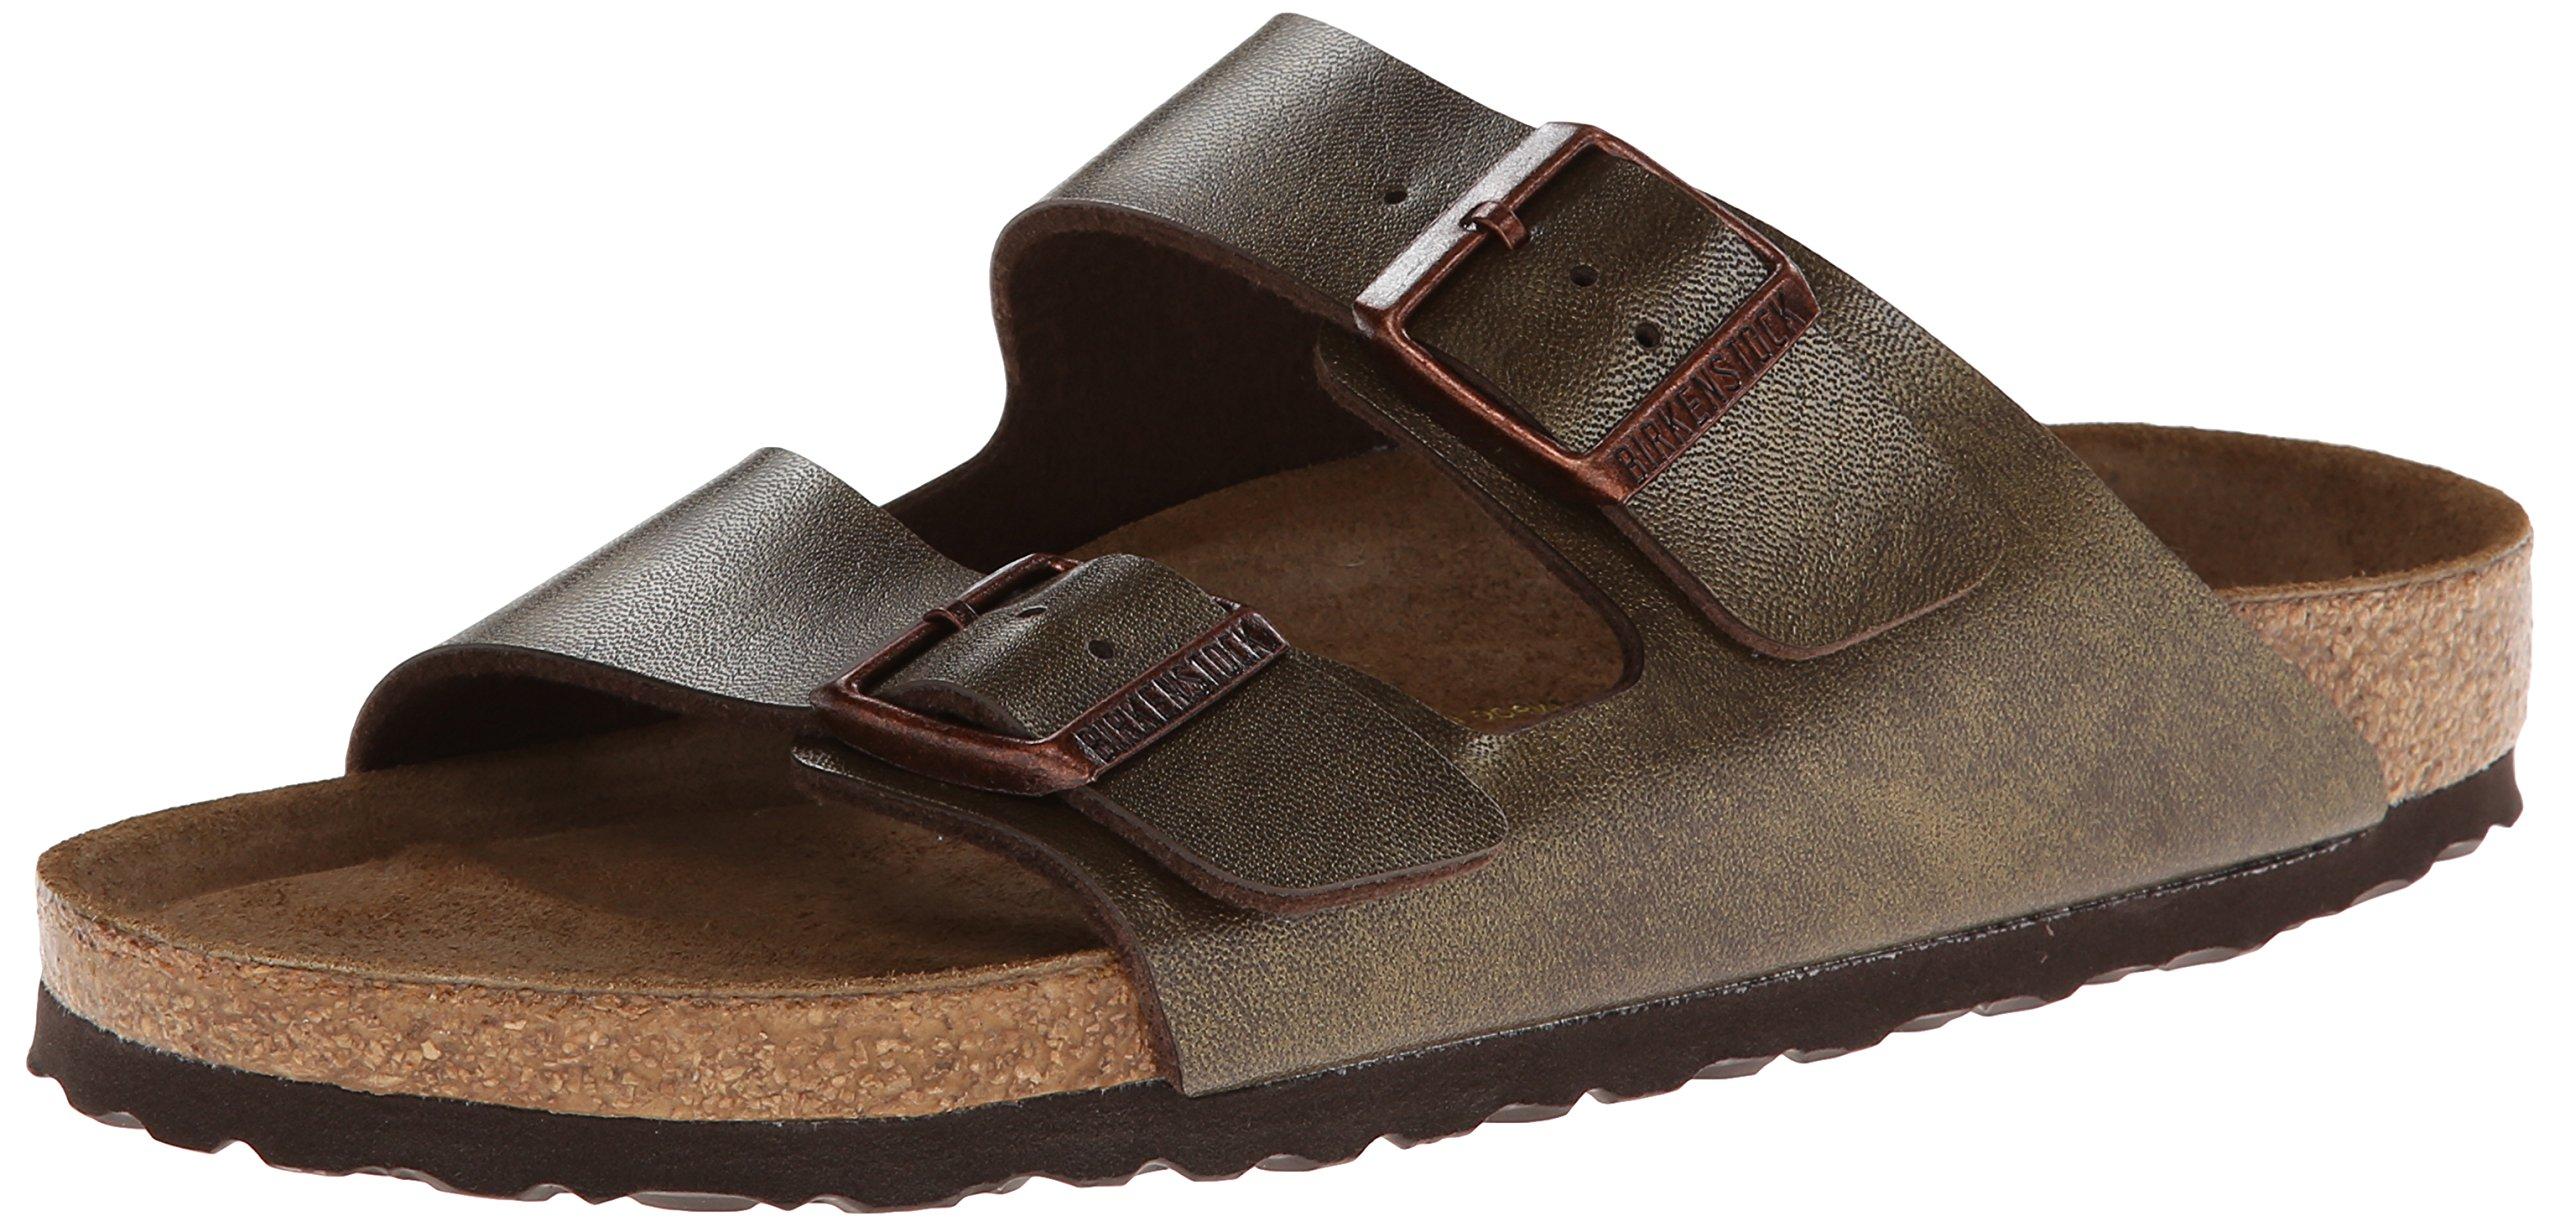 Birkenstock Unisex Arizona Golden Brown Sandals - 41 N EU/10-10.5 2A(N) US Women/8-8.5 2A(N) US Men